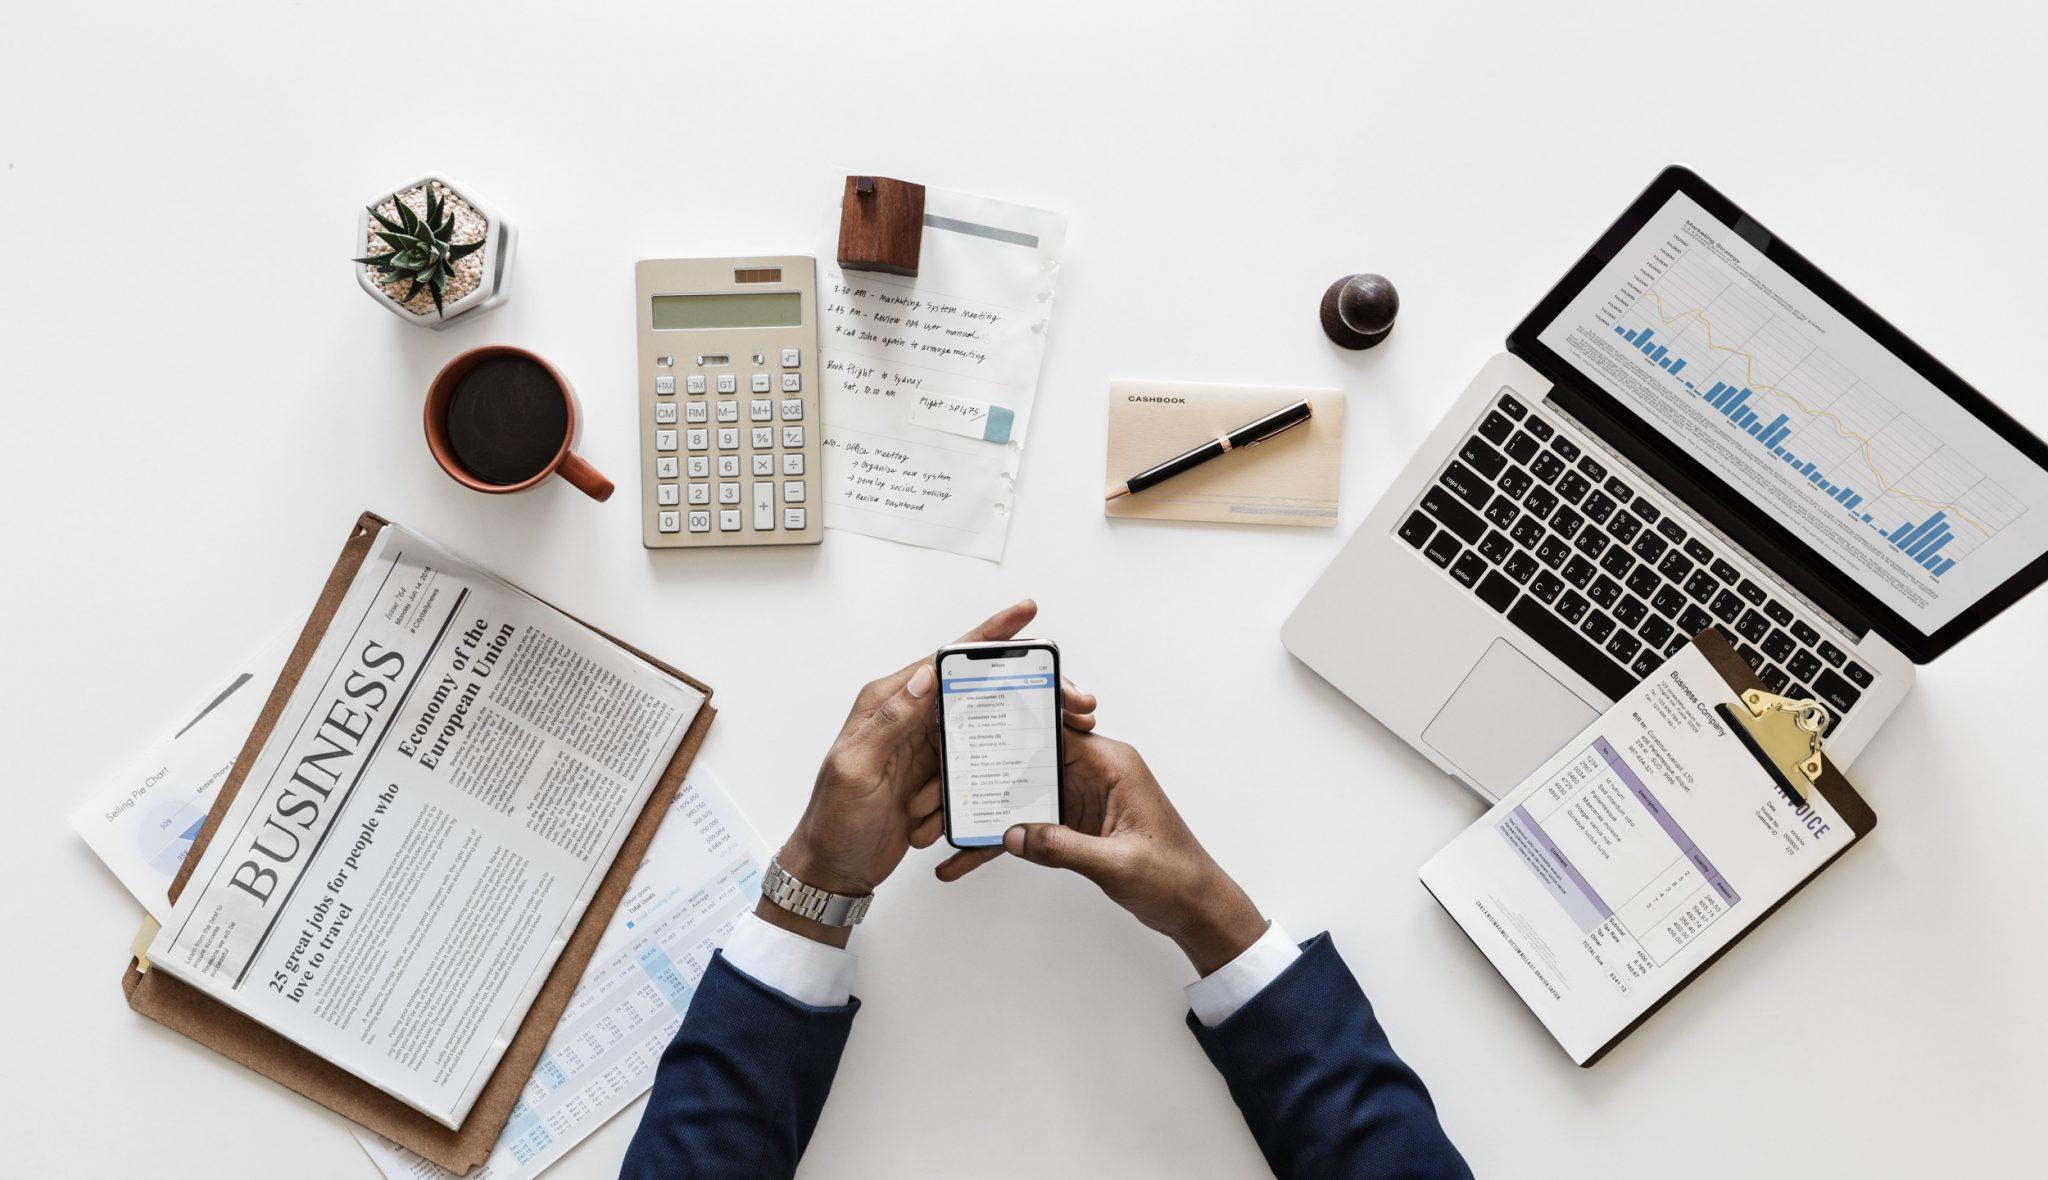 Xero makes getting loans simpler